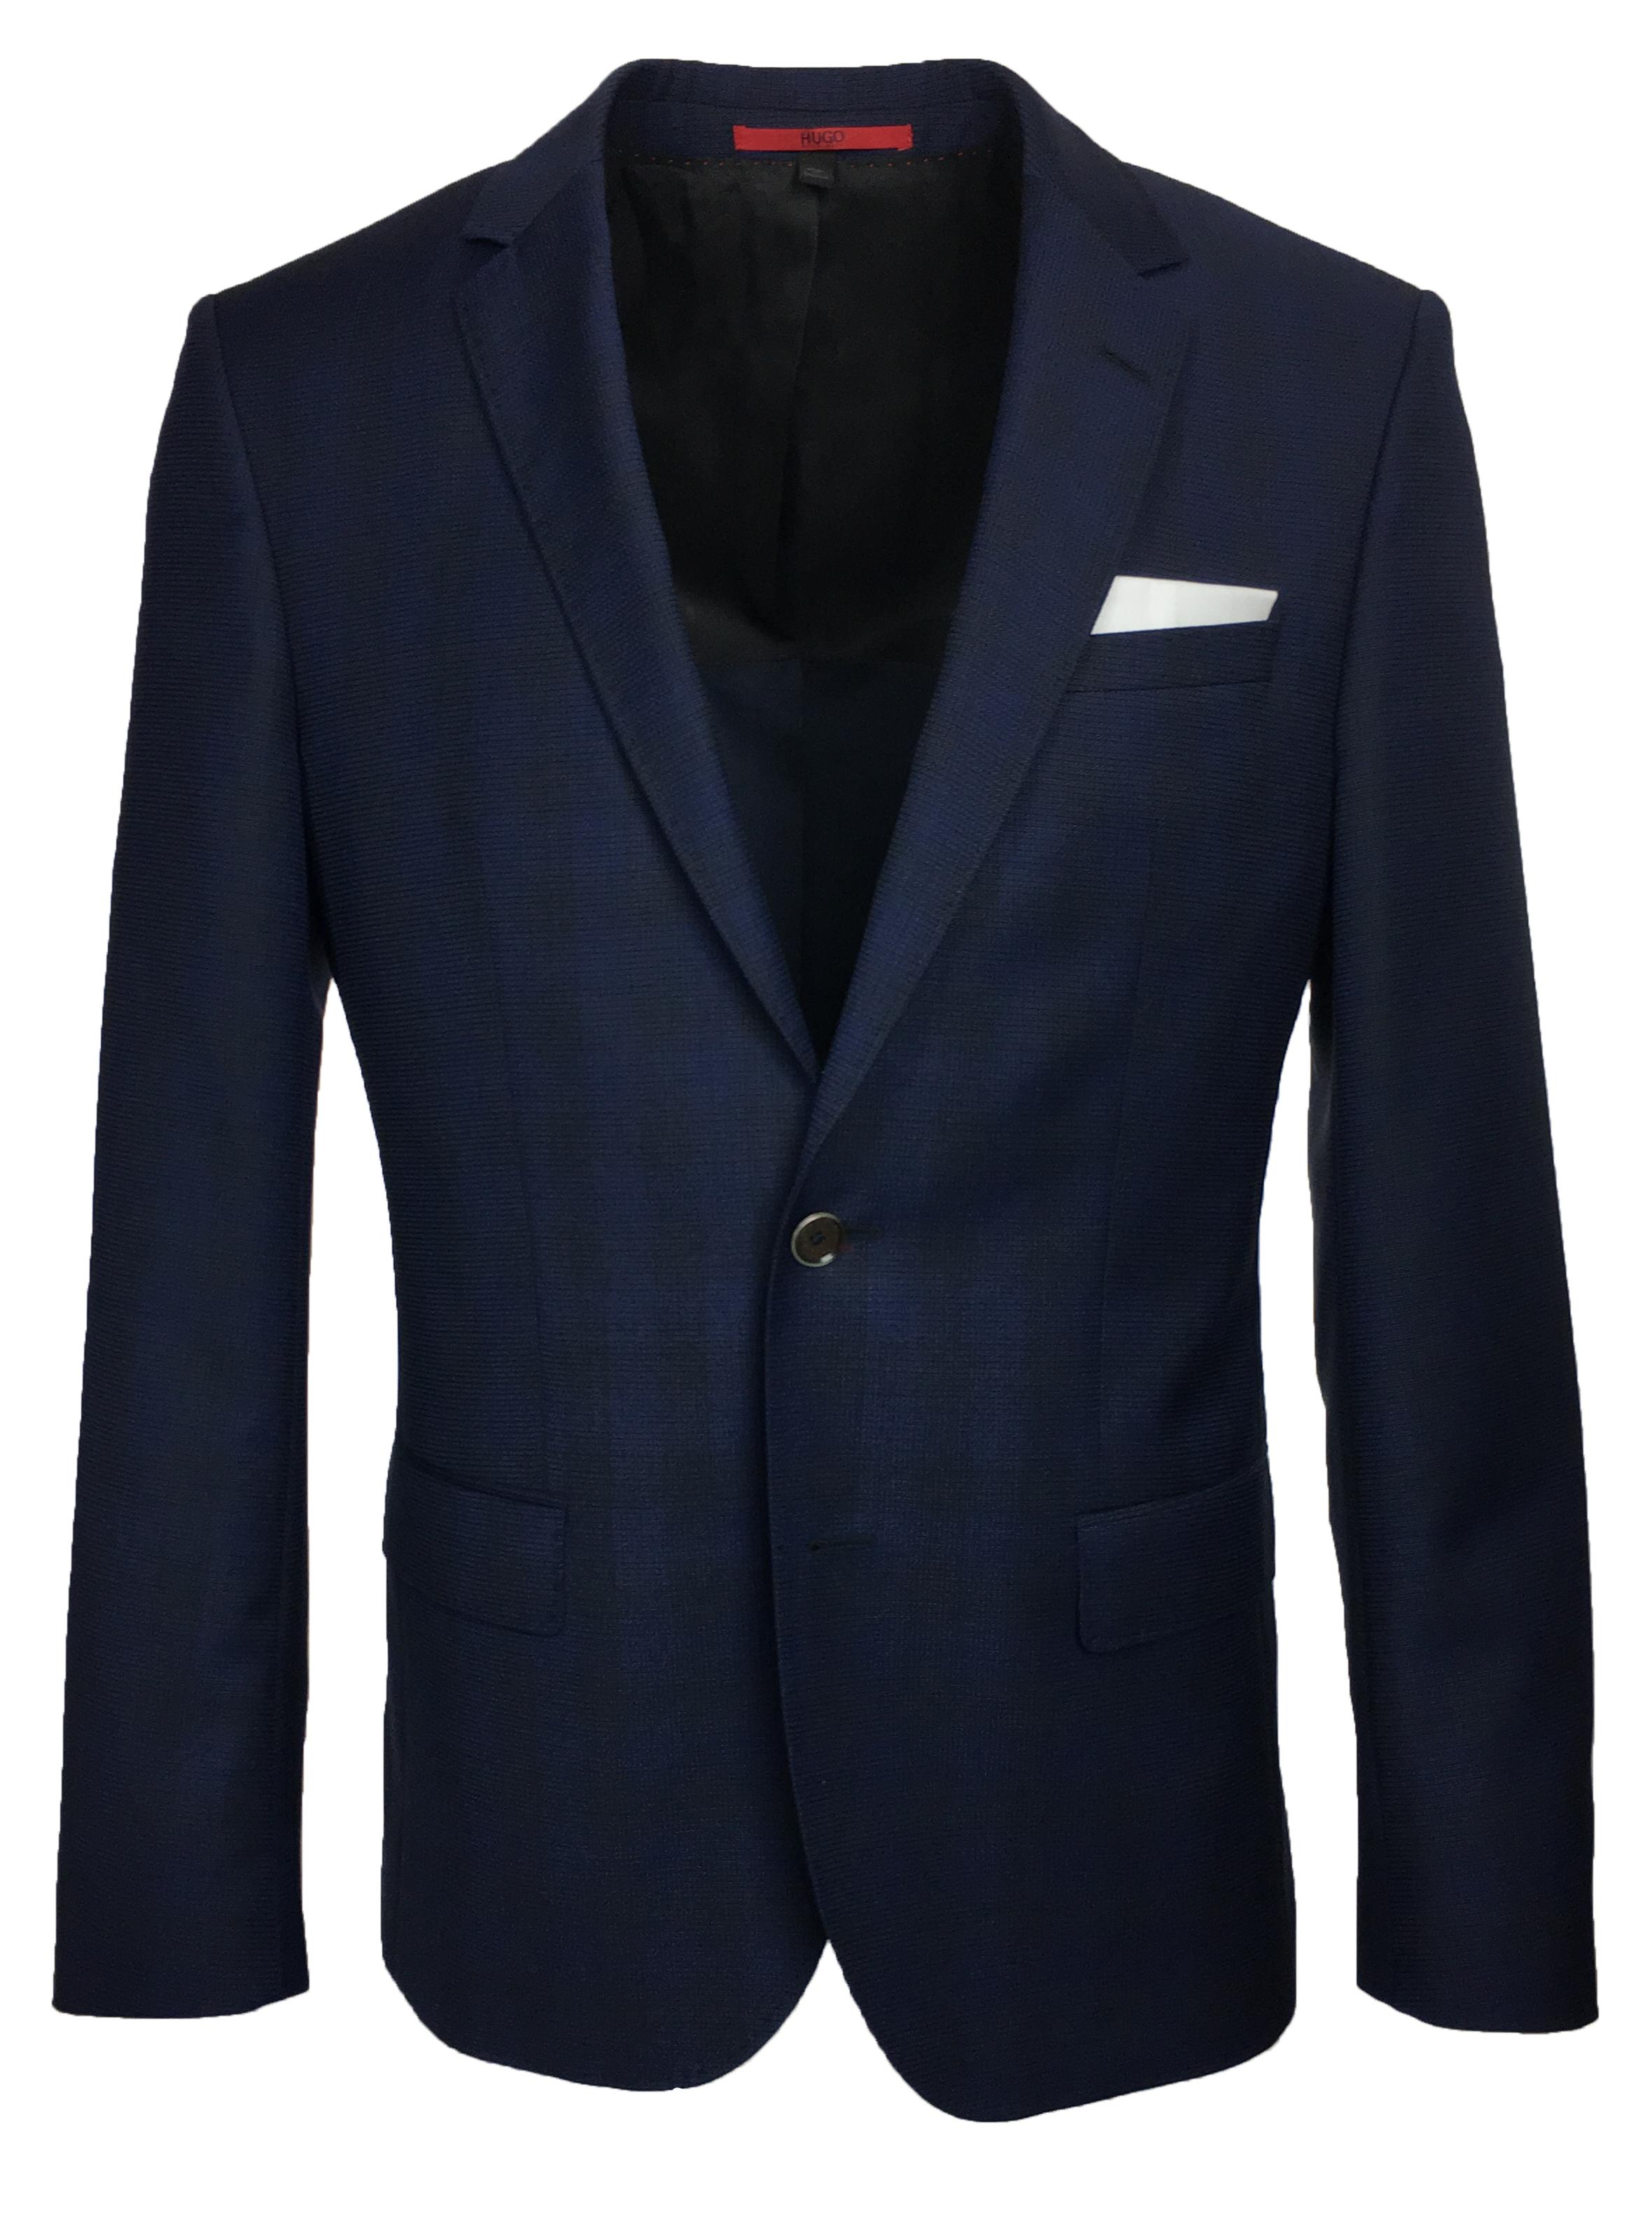 hugo boss men 39 s c hutsons1 slim fit navy sport coat ebay. Black Bedroom Furniture Sets. Home Design Ideas